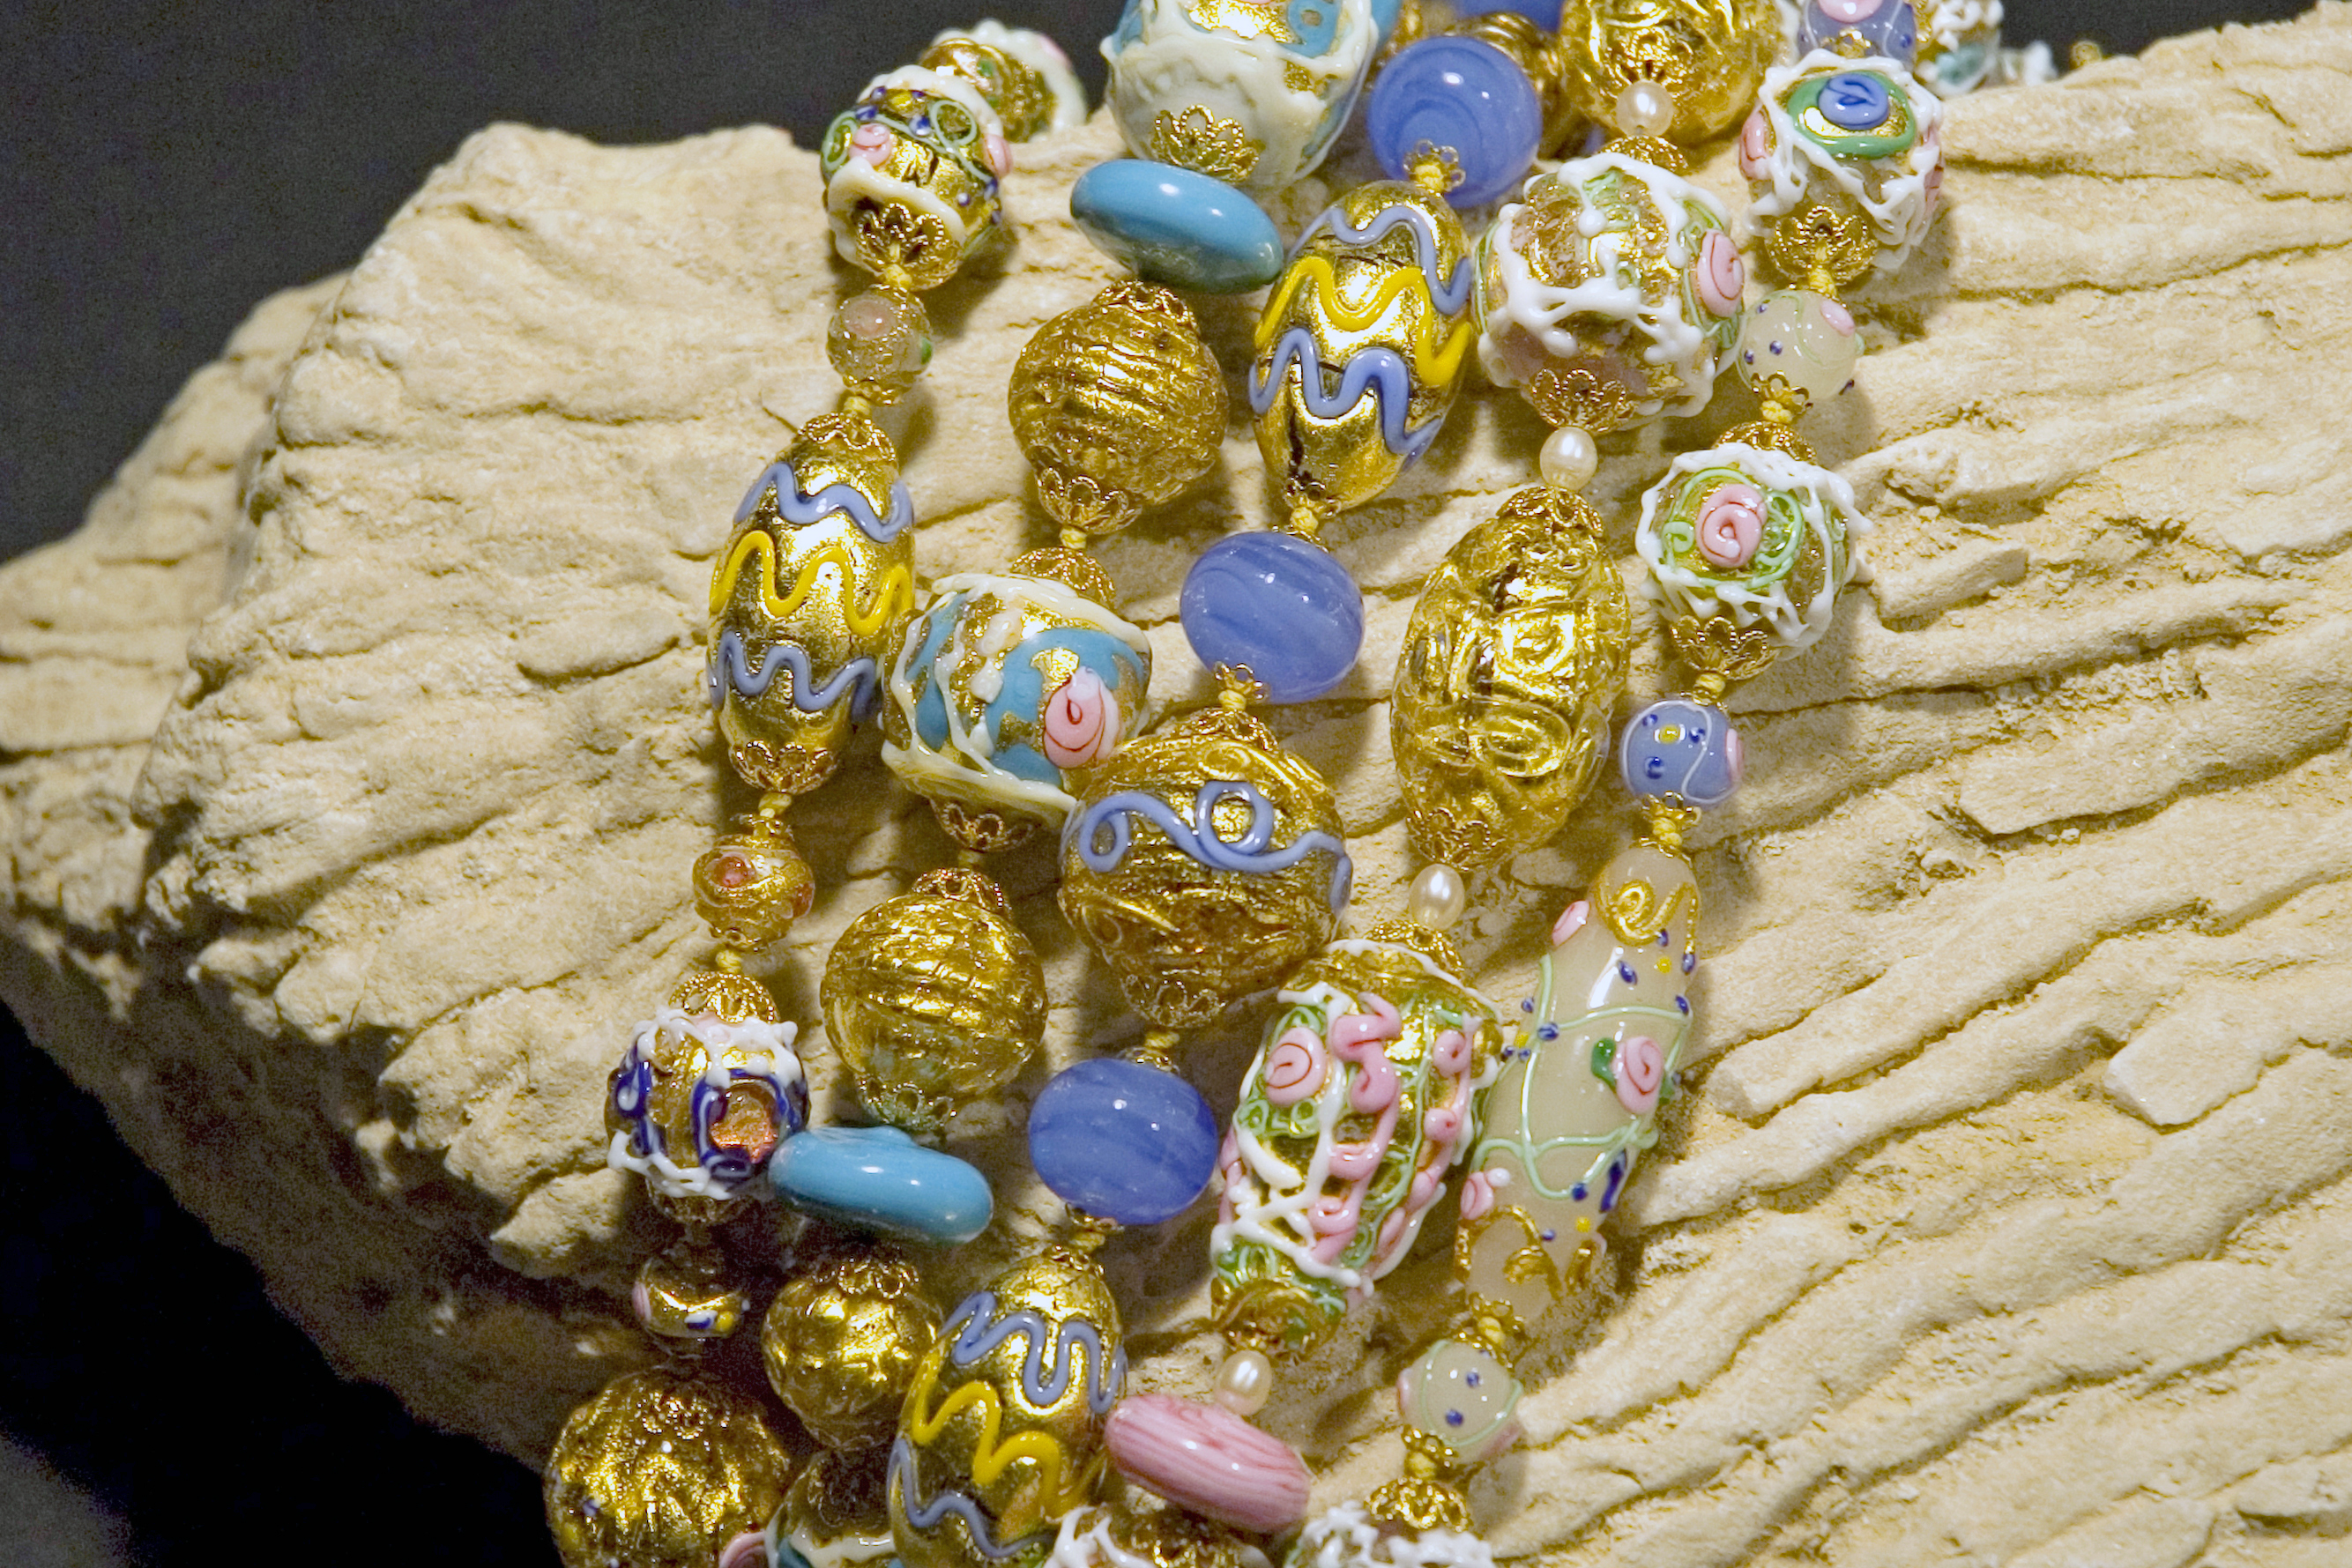 la-perla-veneziana-artigiani-del-vetro-murano-venezia-gallery-0